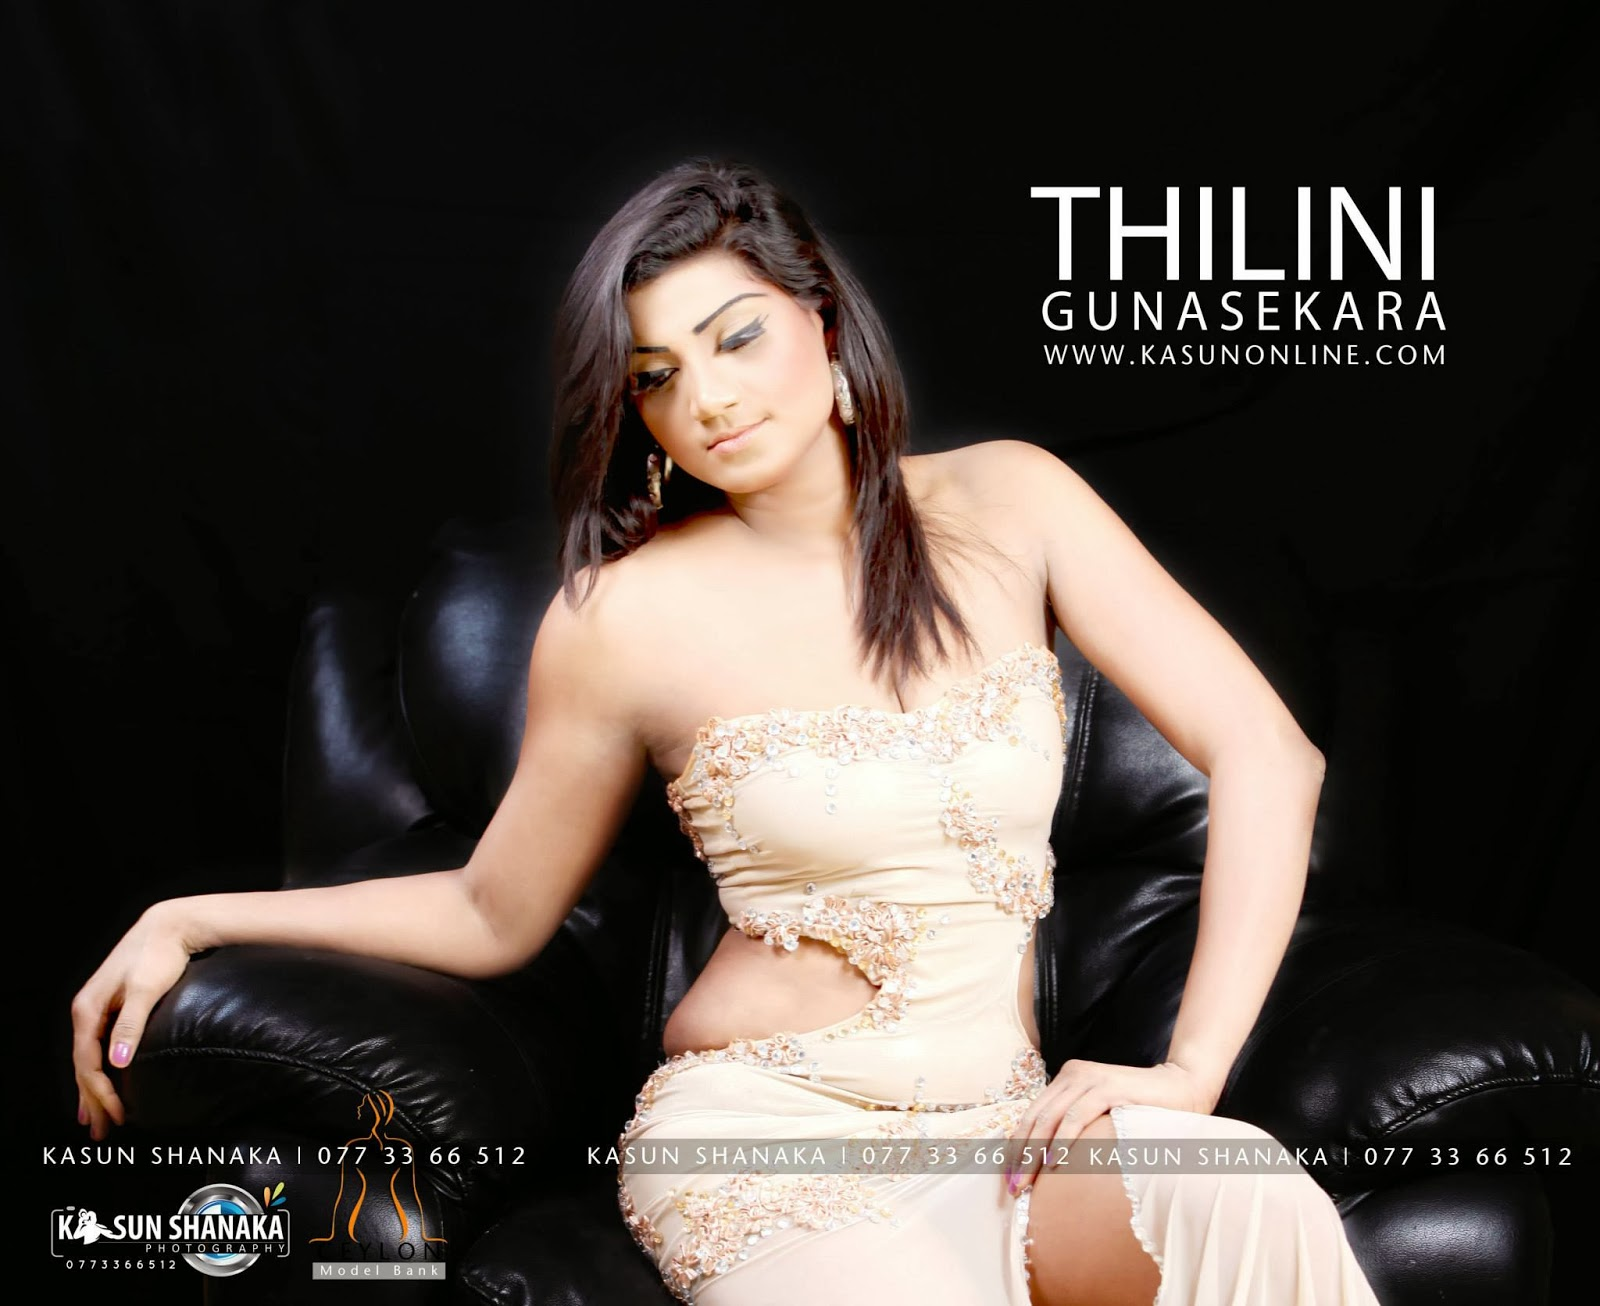 Thilini Gunasekara hot